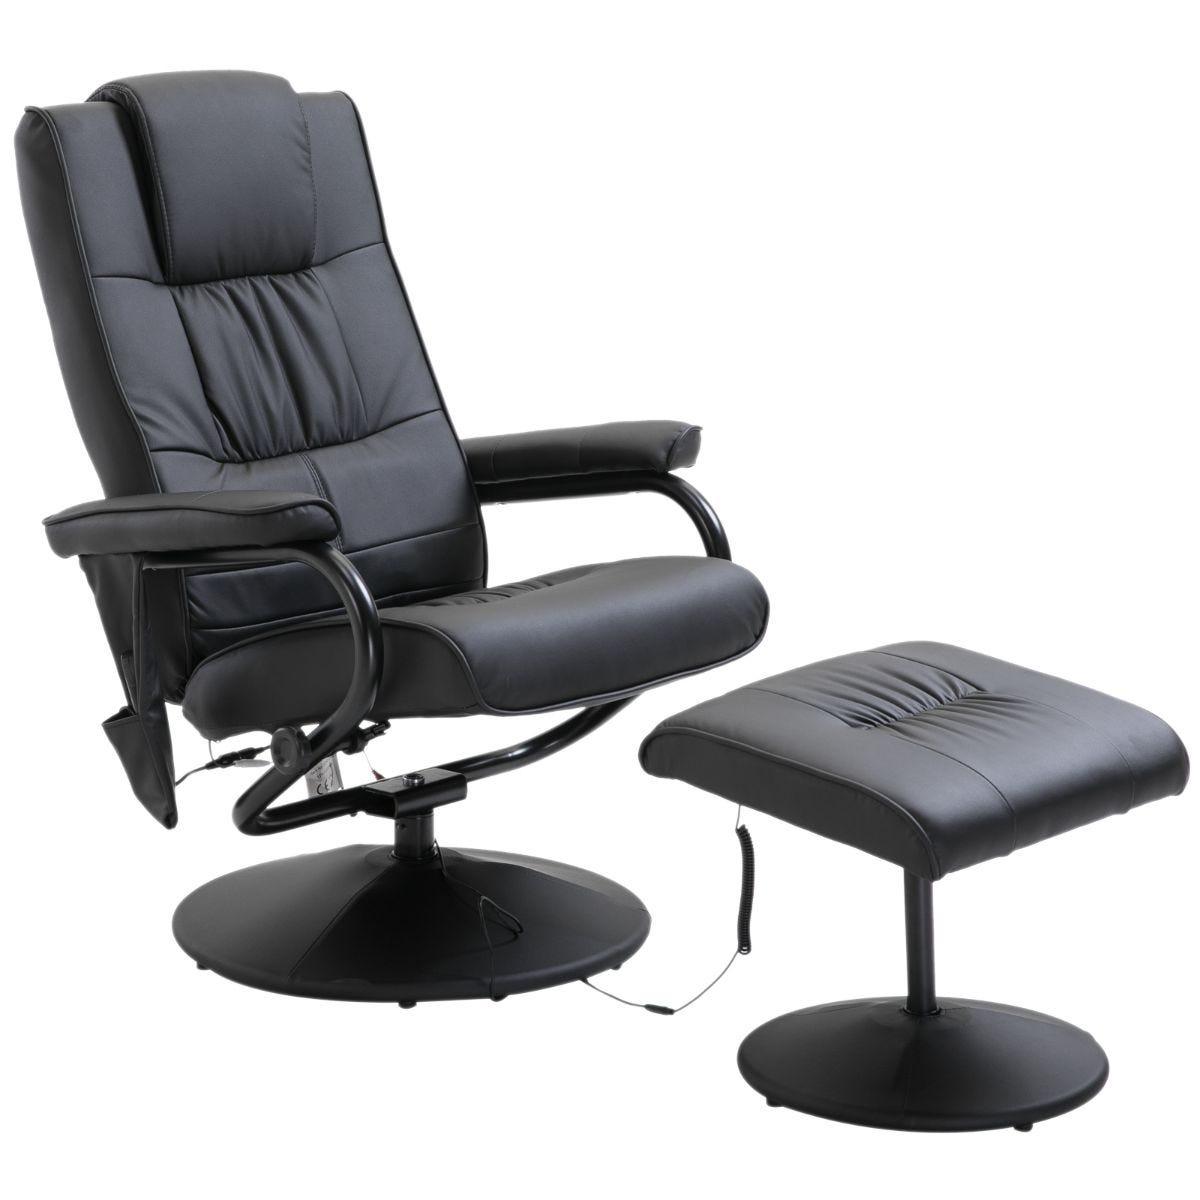 HOMCOM Electric Massage Chair Sofa Recliner Foot Stool 10 Point Massager Ergonomically